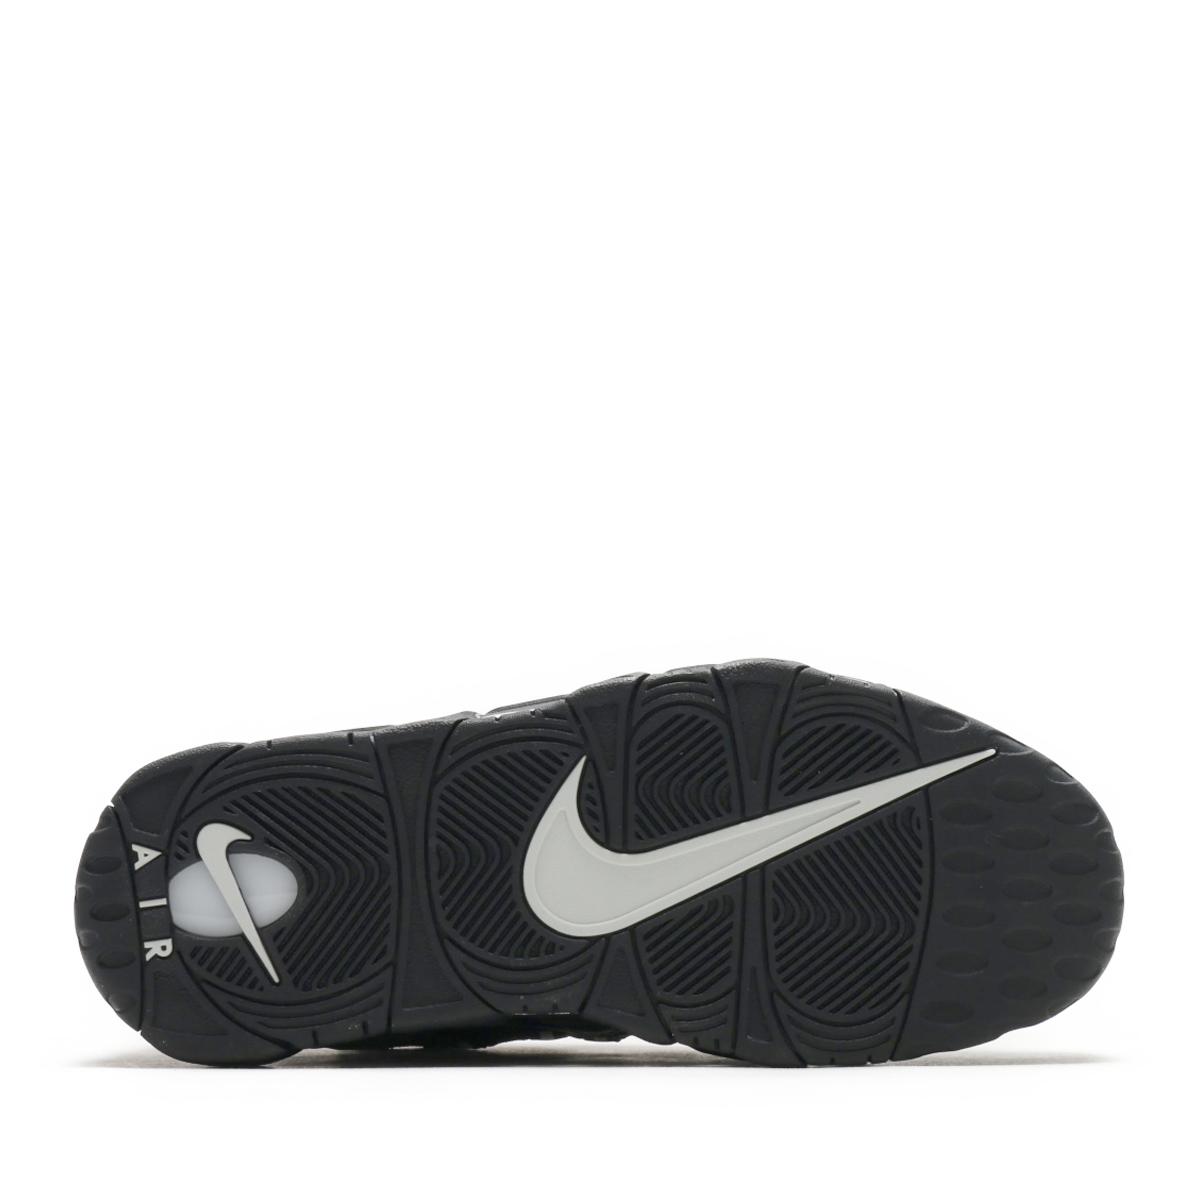 NIKE AIR MORE MONEY (Nike air more money) (BLACK/METALLIC SILVER-BLACK)  18SU-S